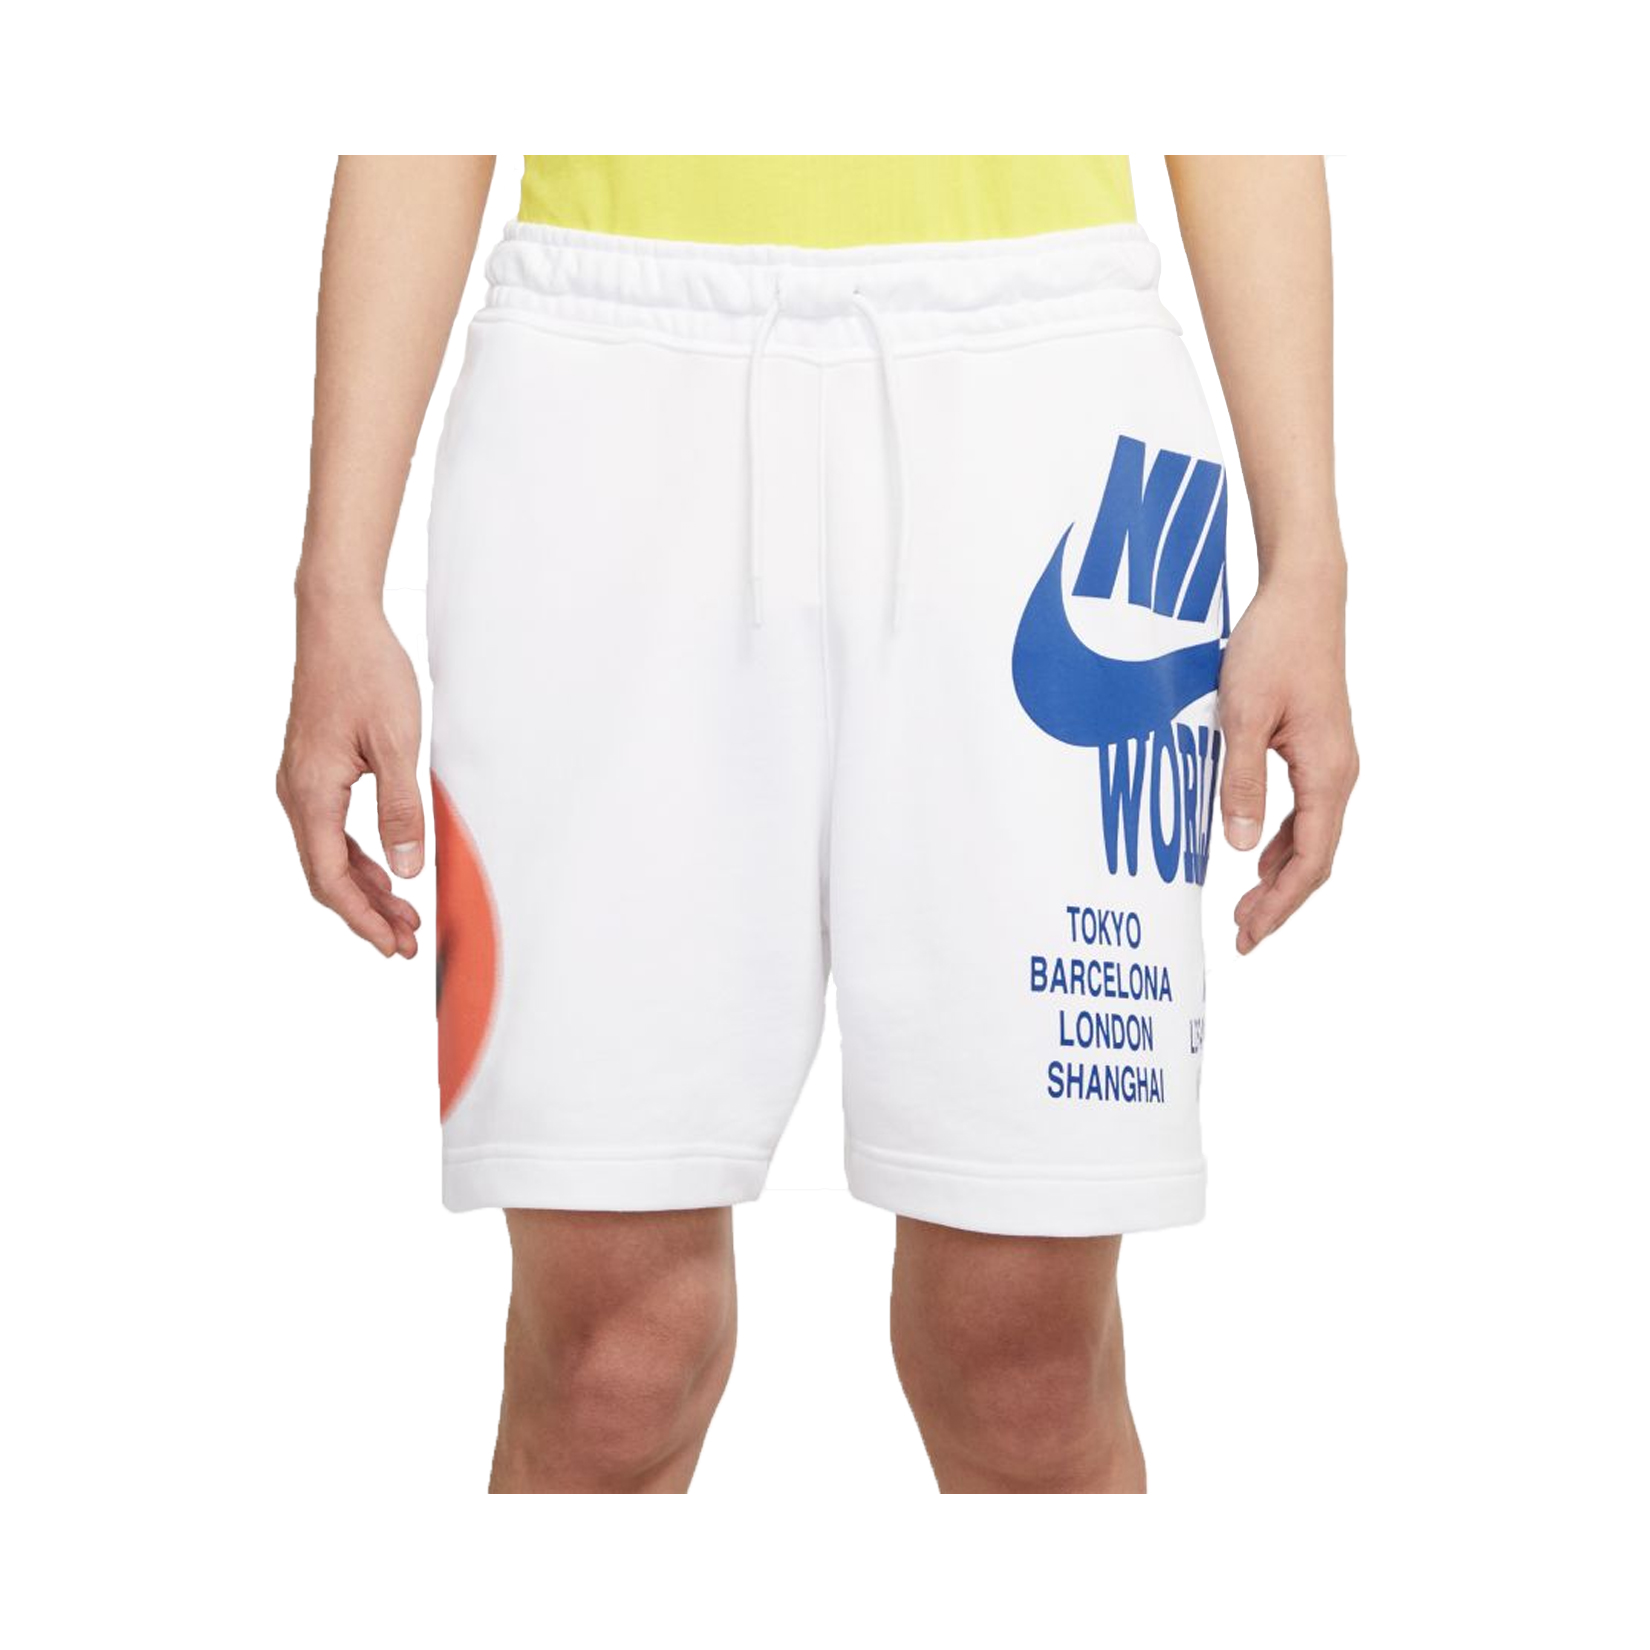 Nike Sportswear World Tour Shorts White